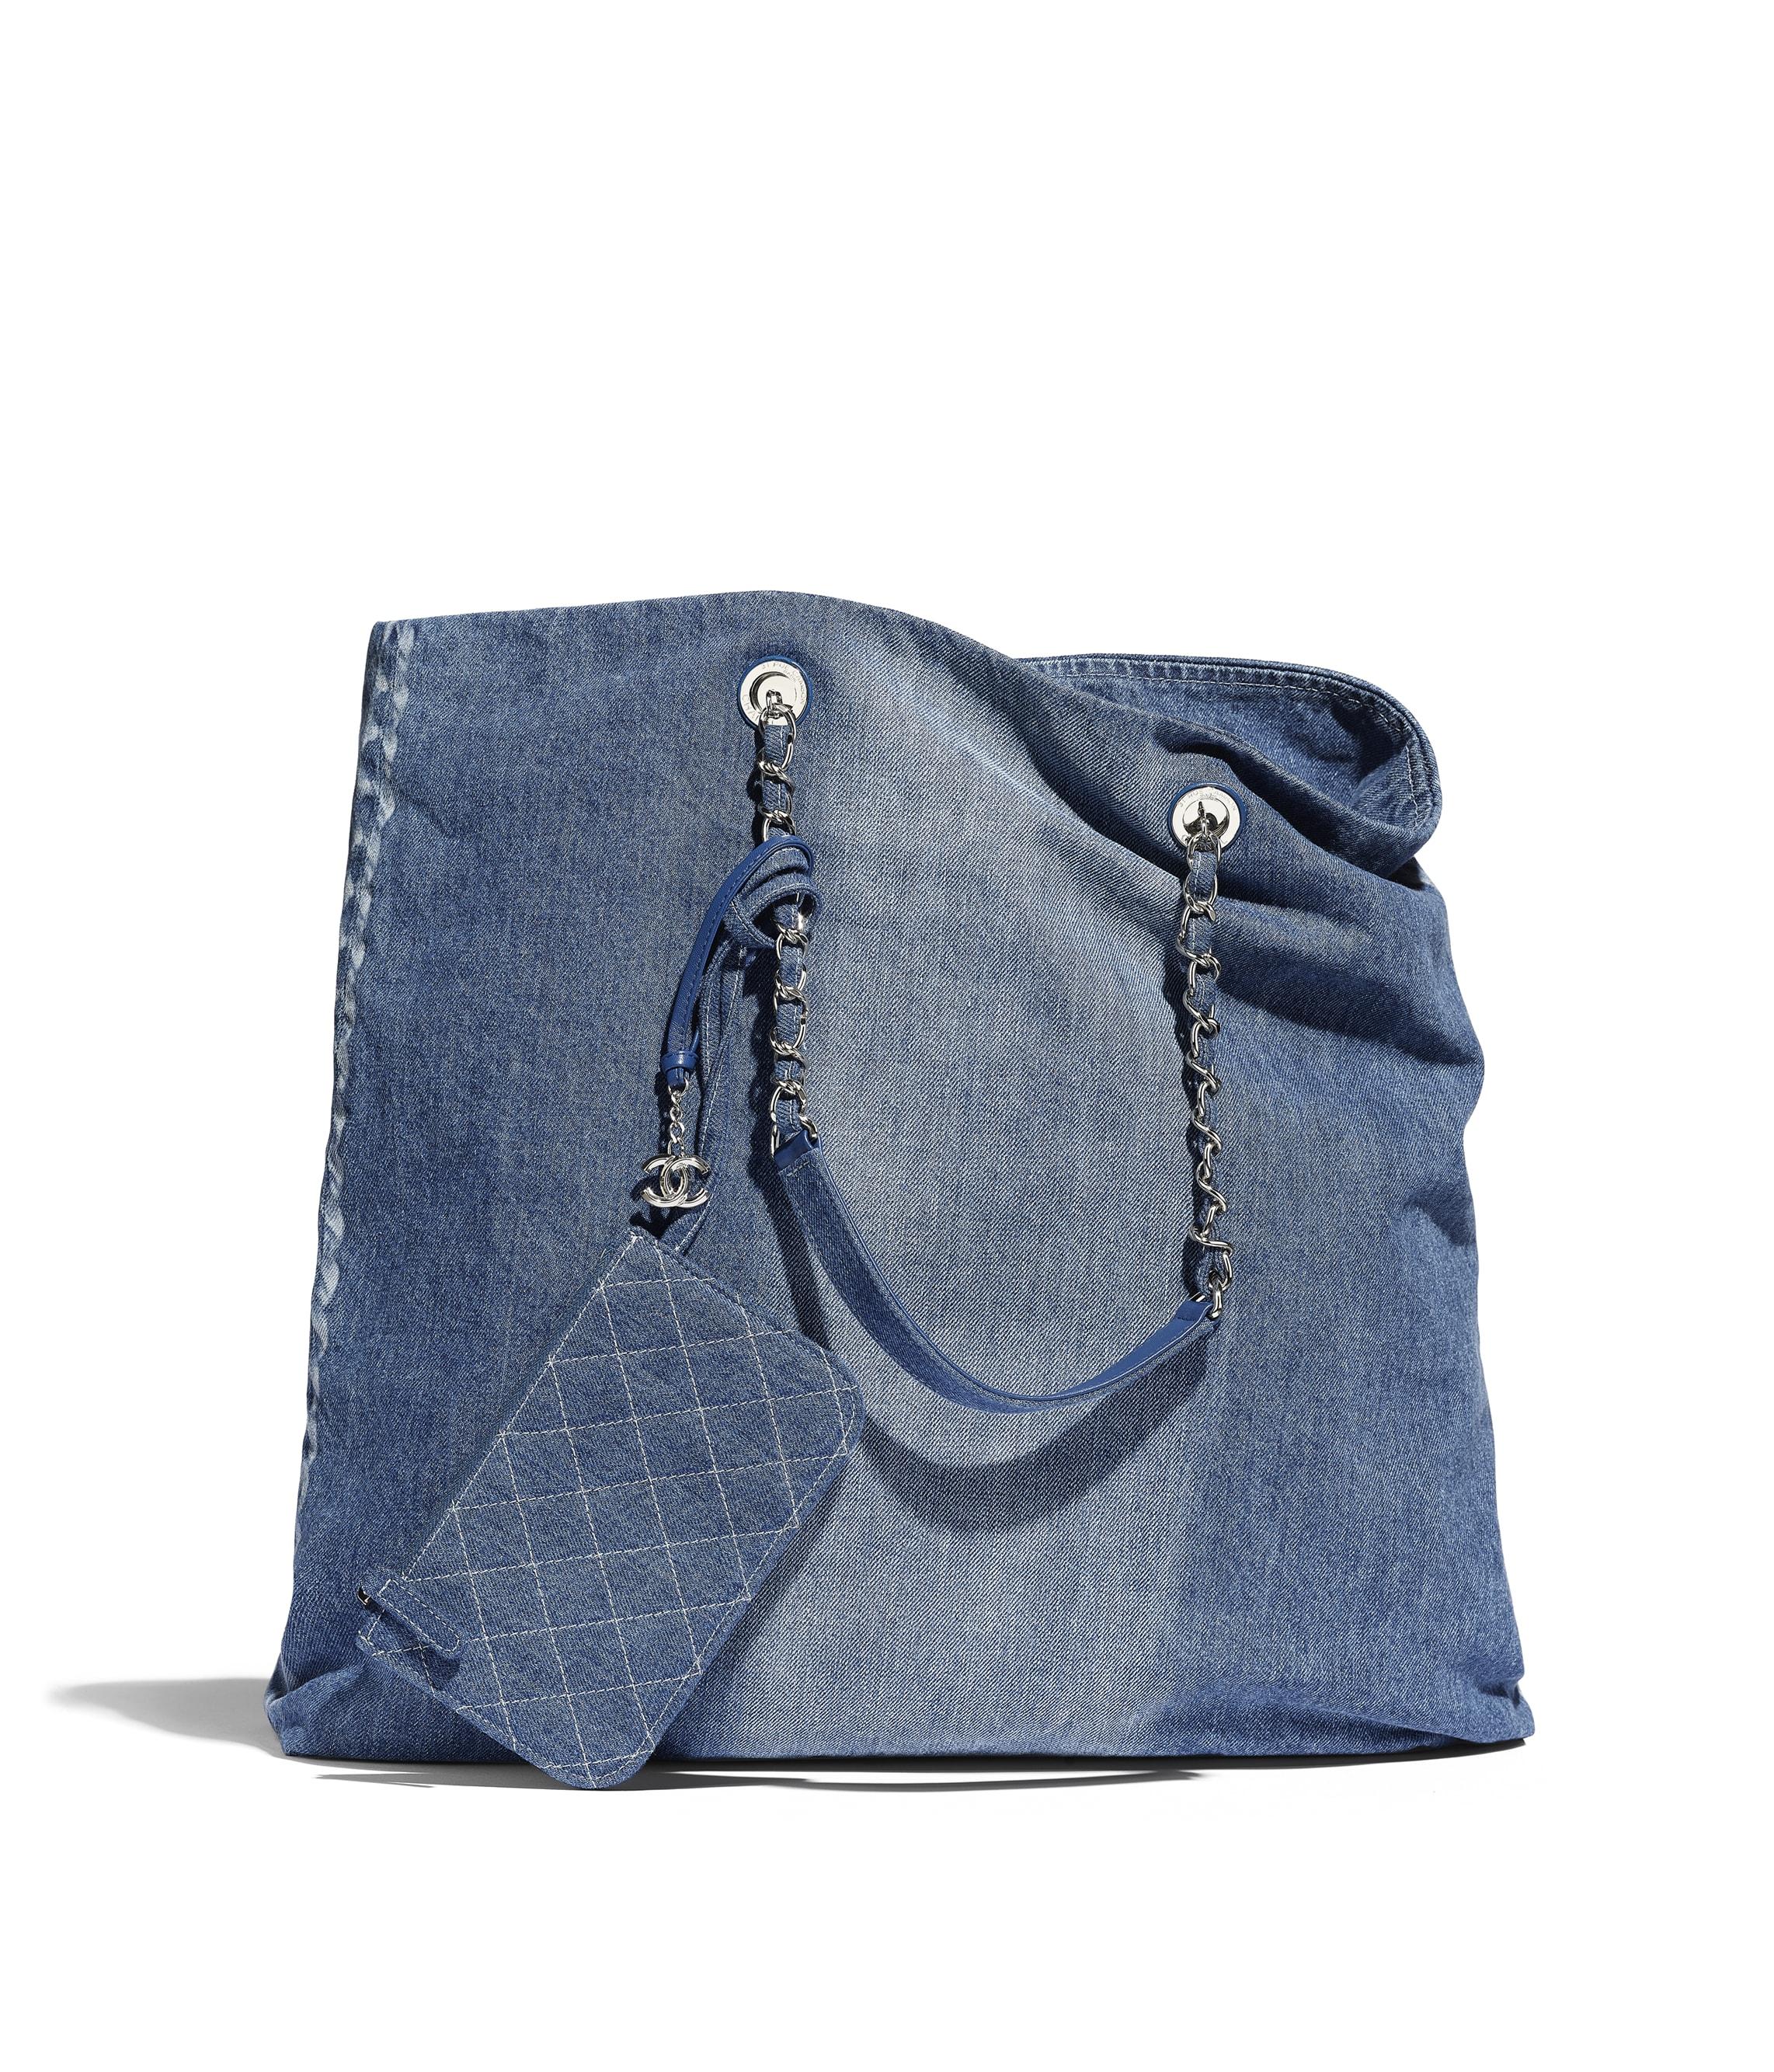 aa08beb2d678 Tote Bags - Handbags - CHANEL